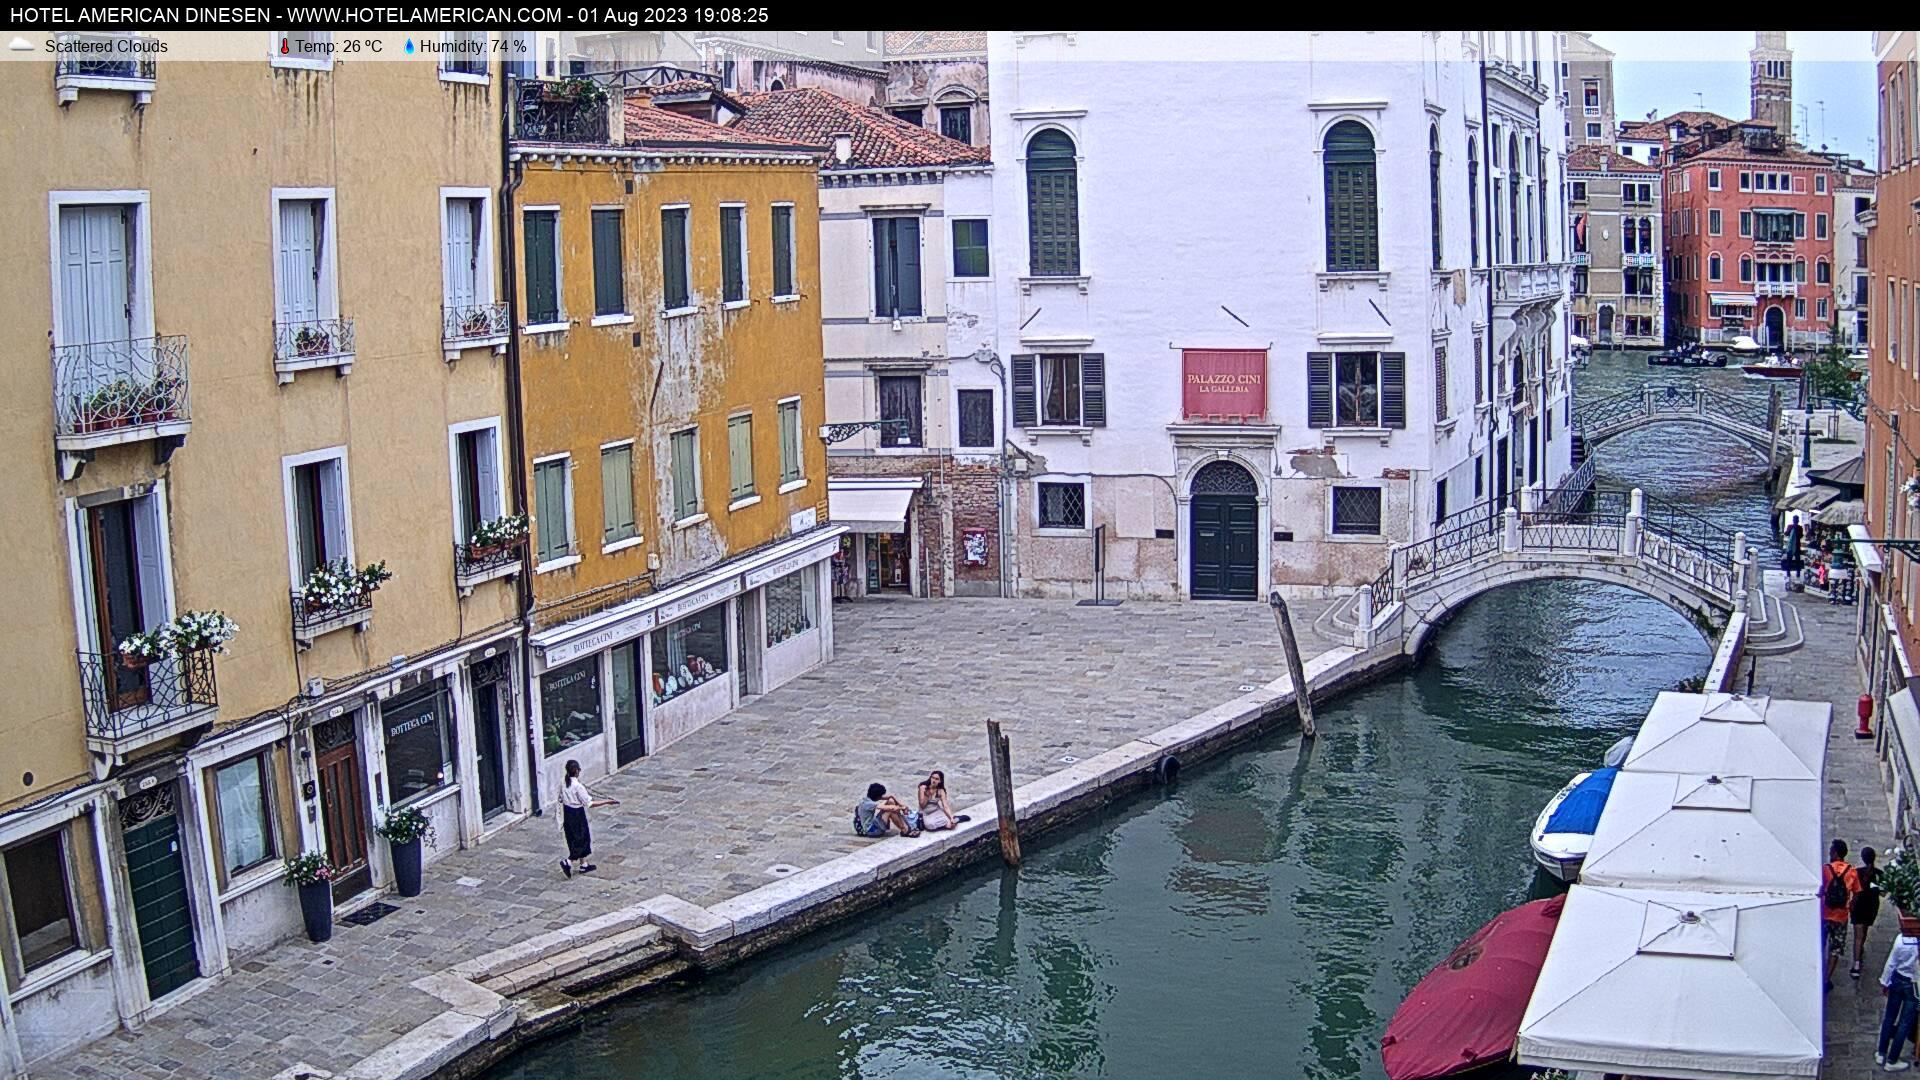 Venedig Sa. 19:08